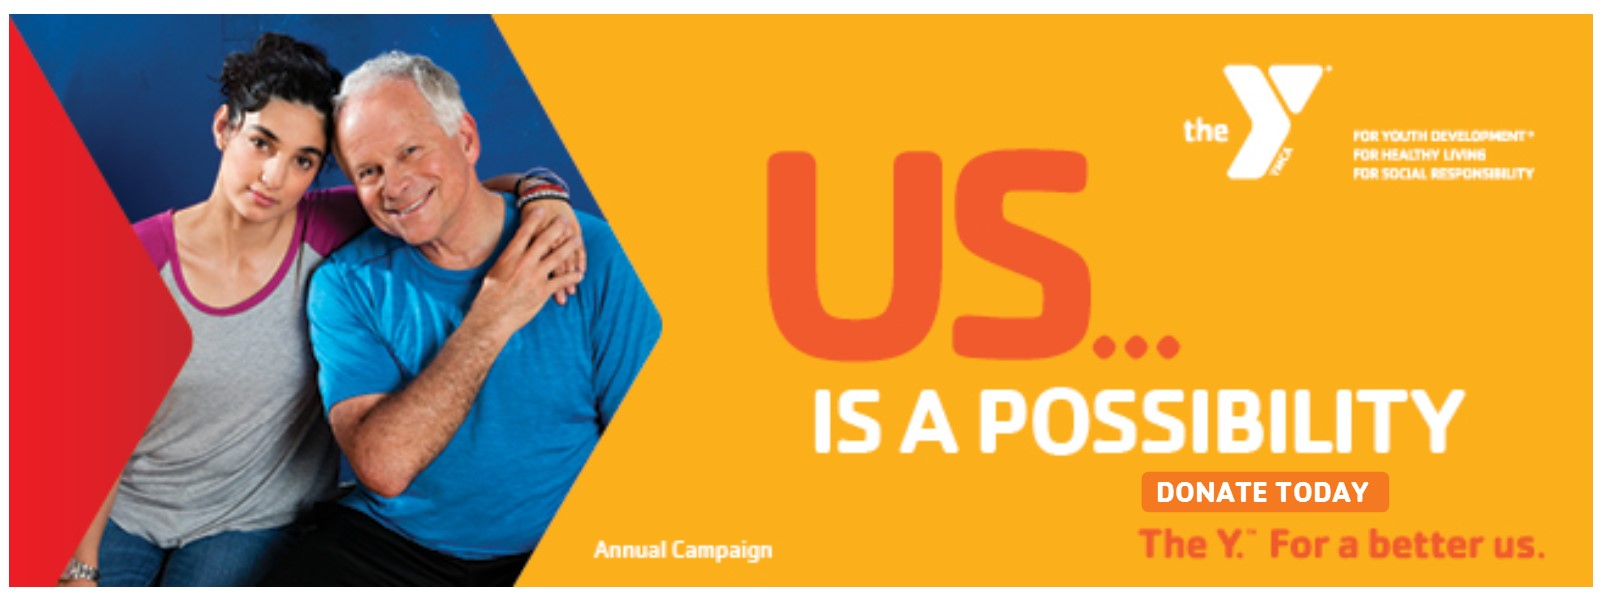 Annual Campaign – Donate Today!